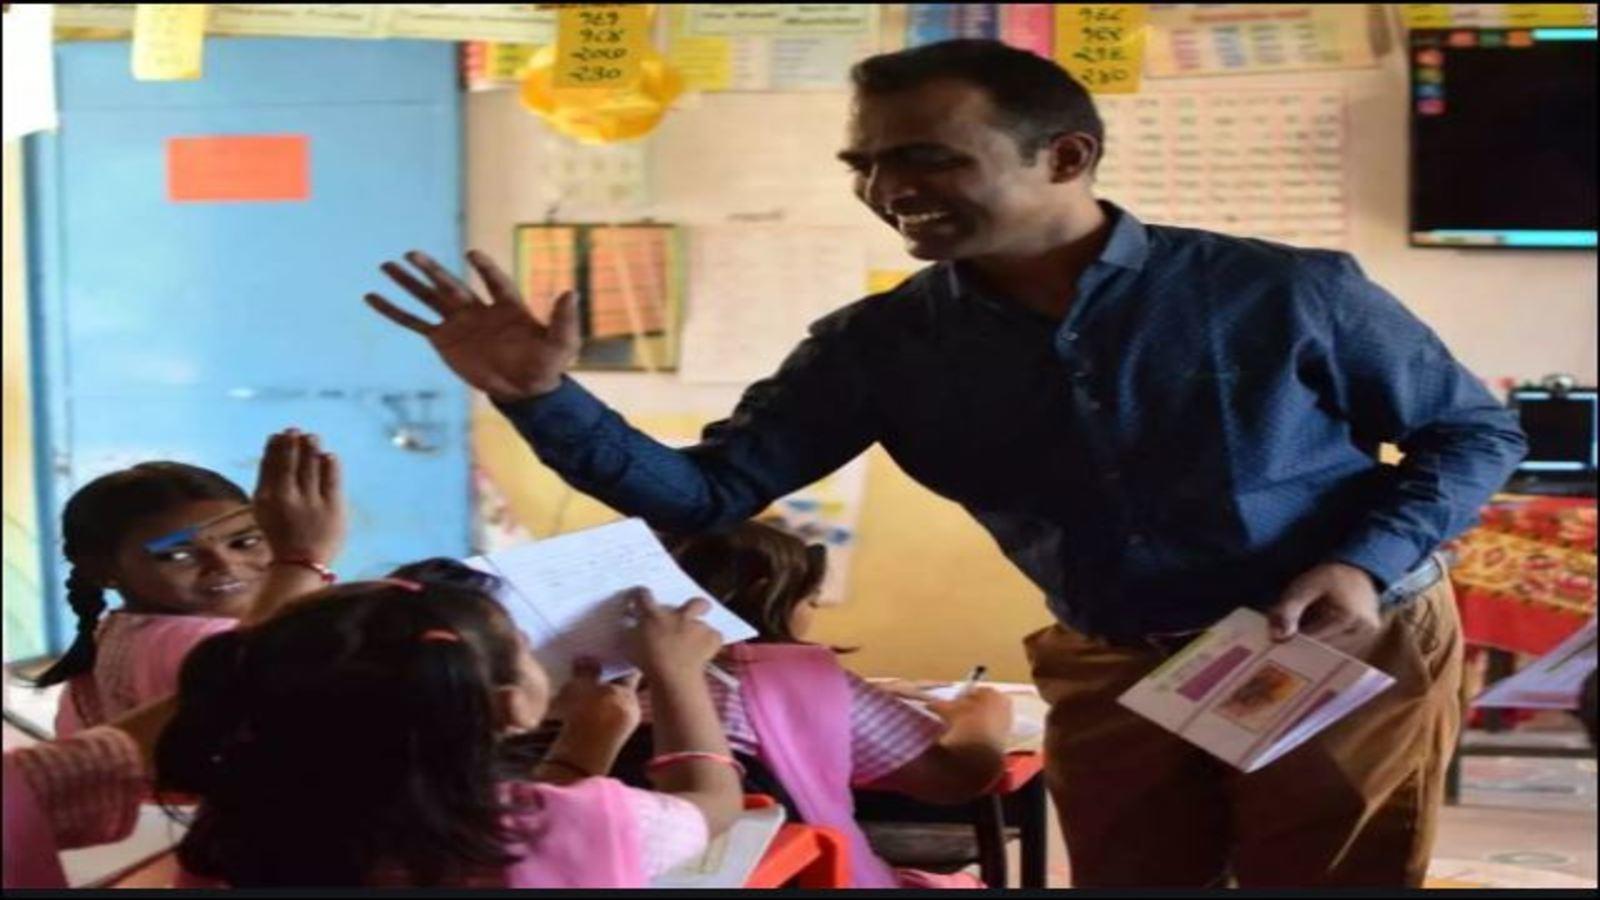 Govt school teacher Ranjitsinh Disale becomes the 1st Indian to win The Global Teacher Award prize 2020